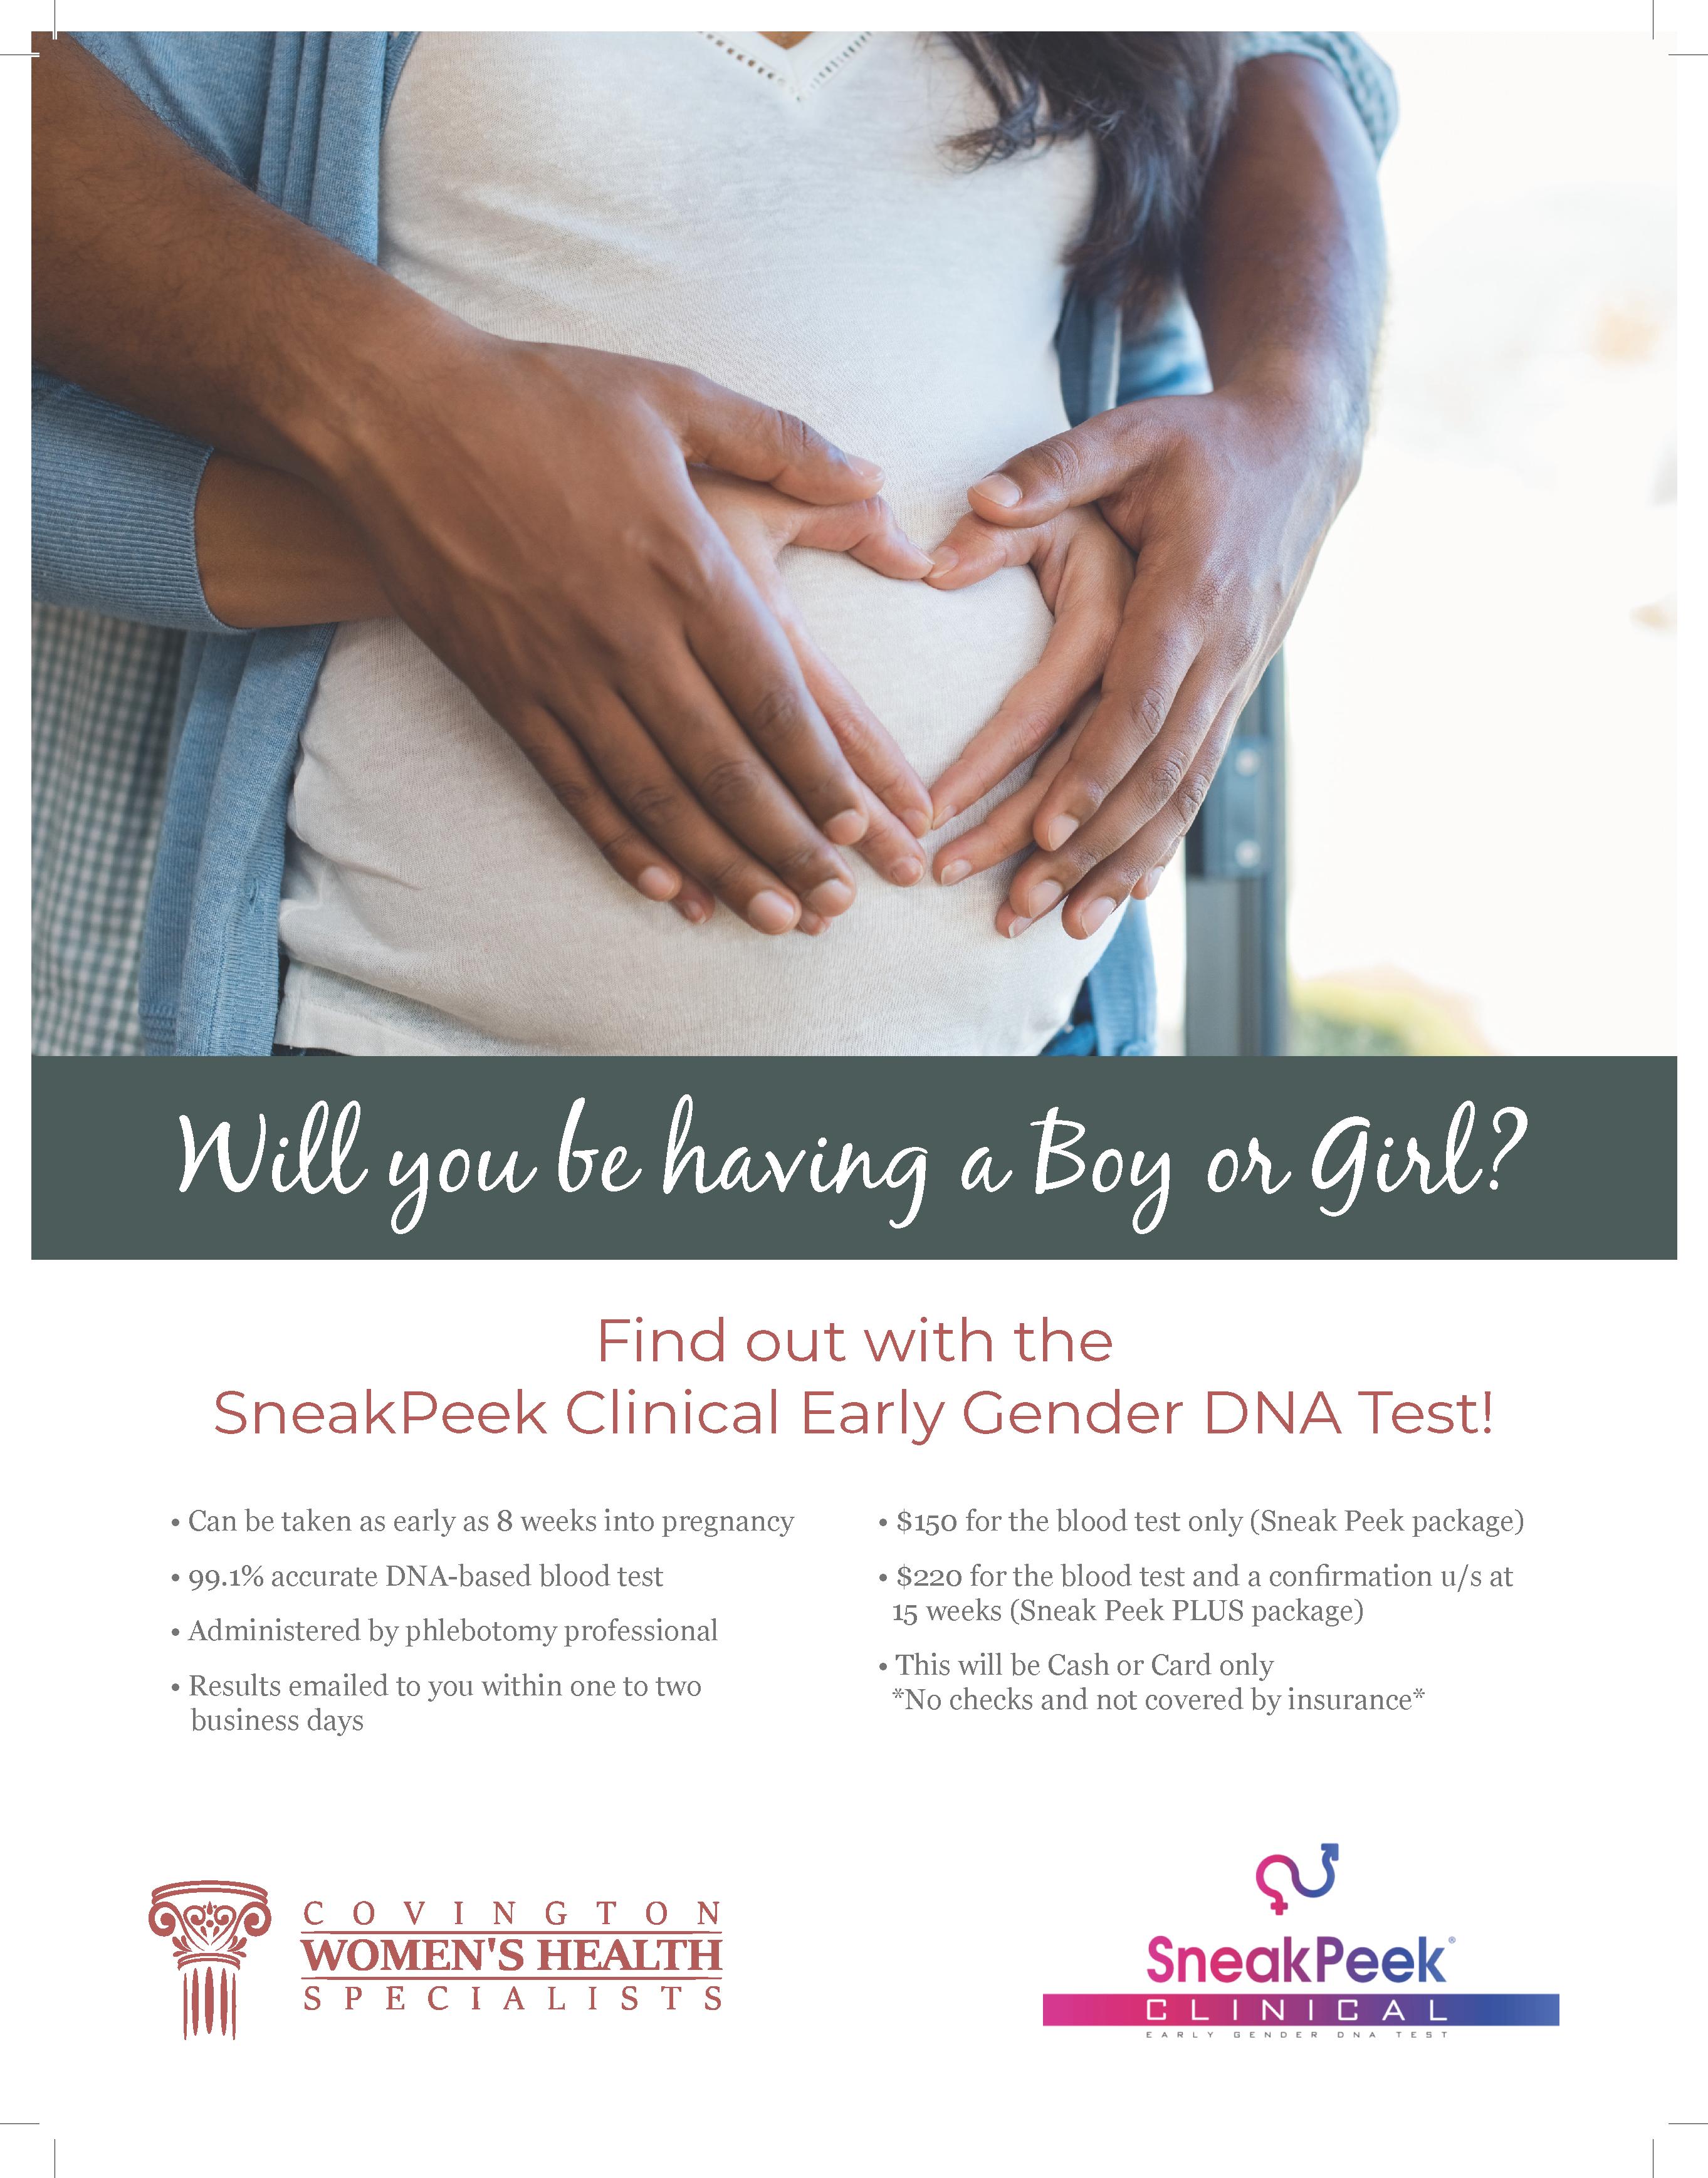 Flyer one of Covington Women's Health gender reveal service.